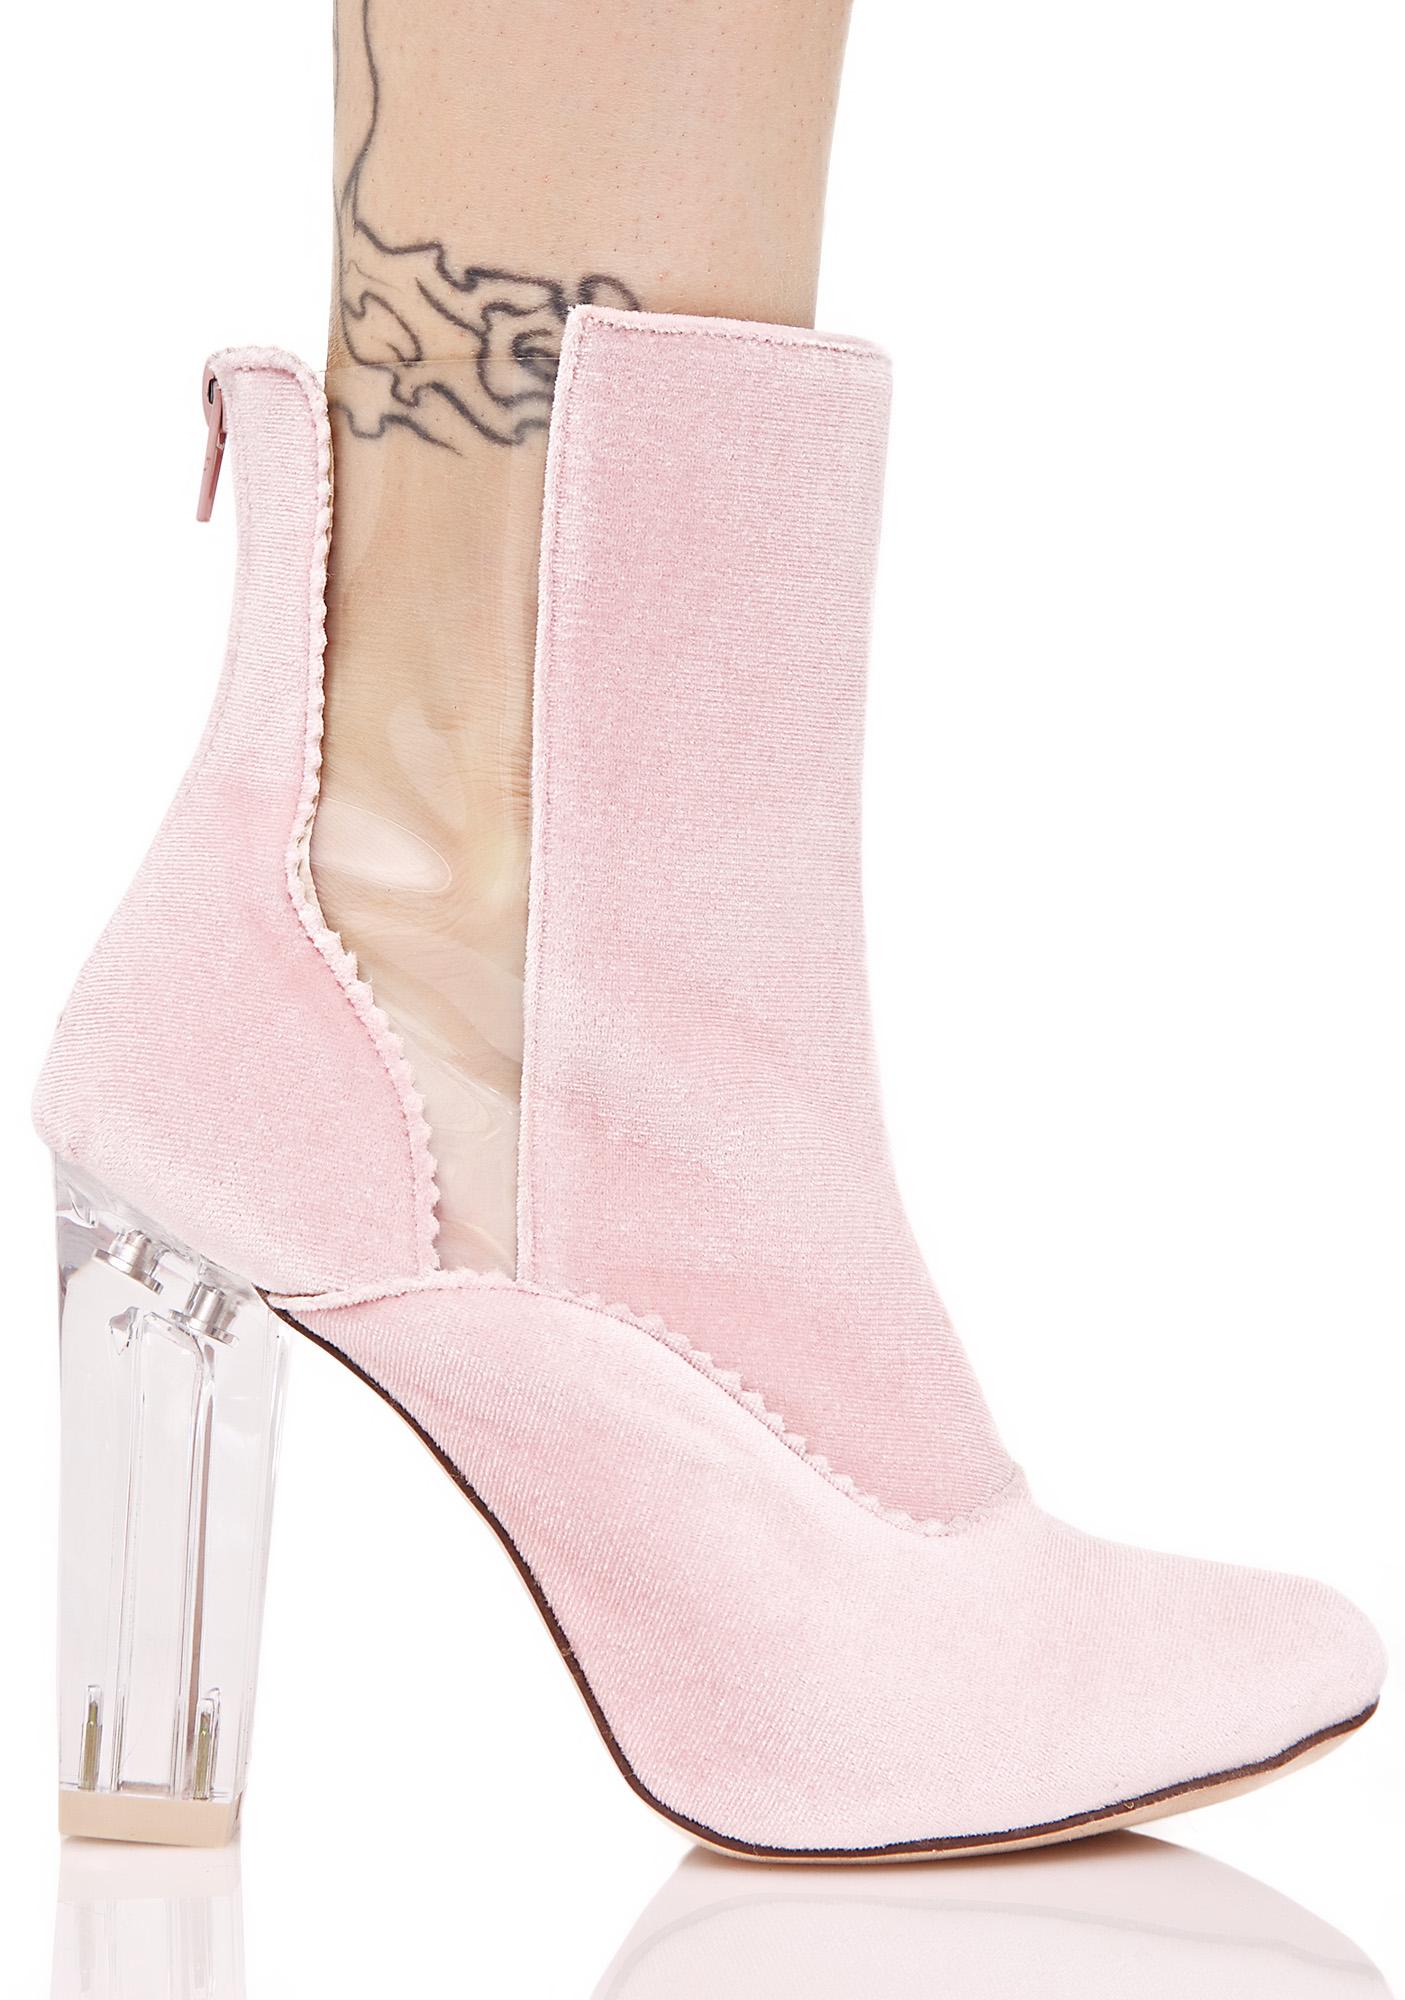 Pink Velvet Transparent Insert Boots